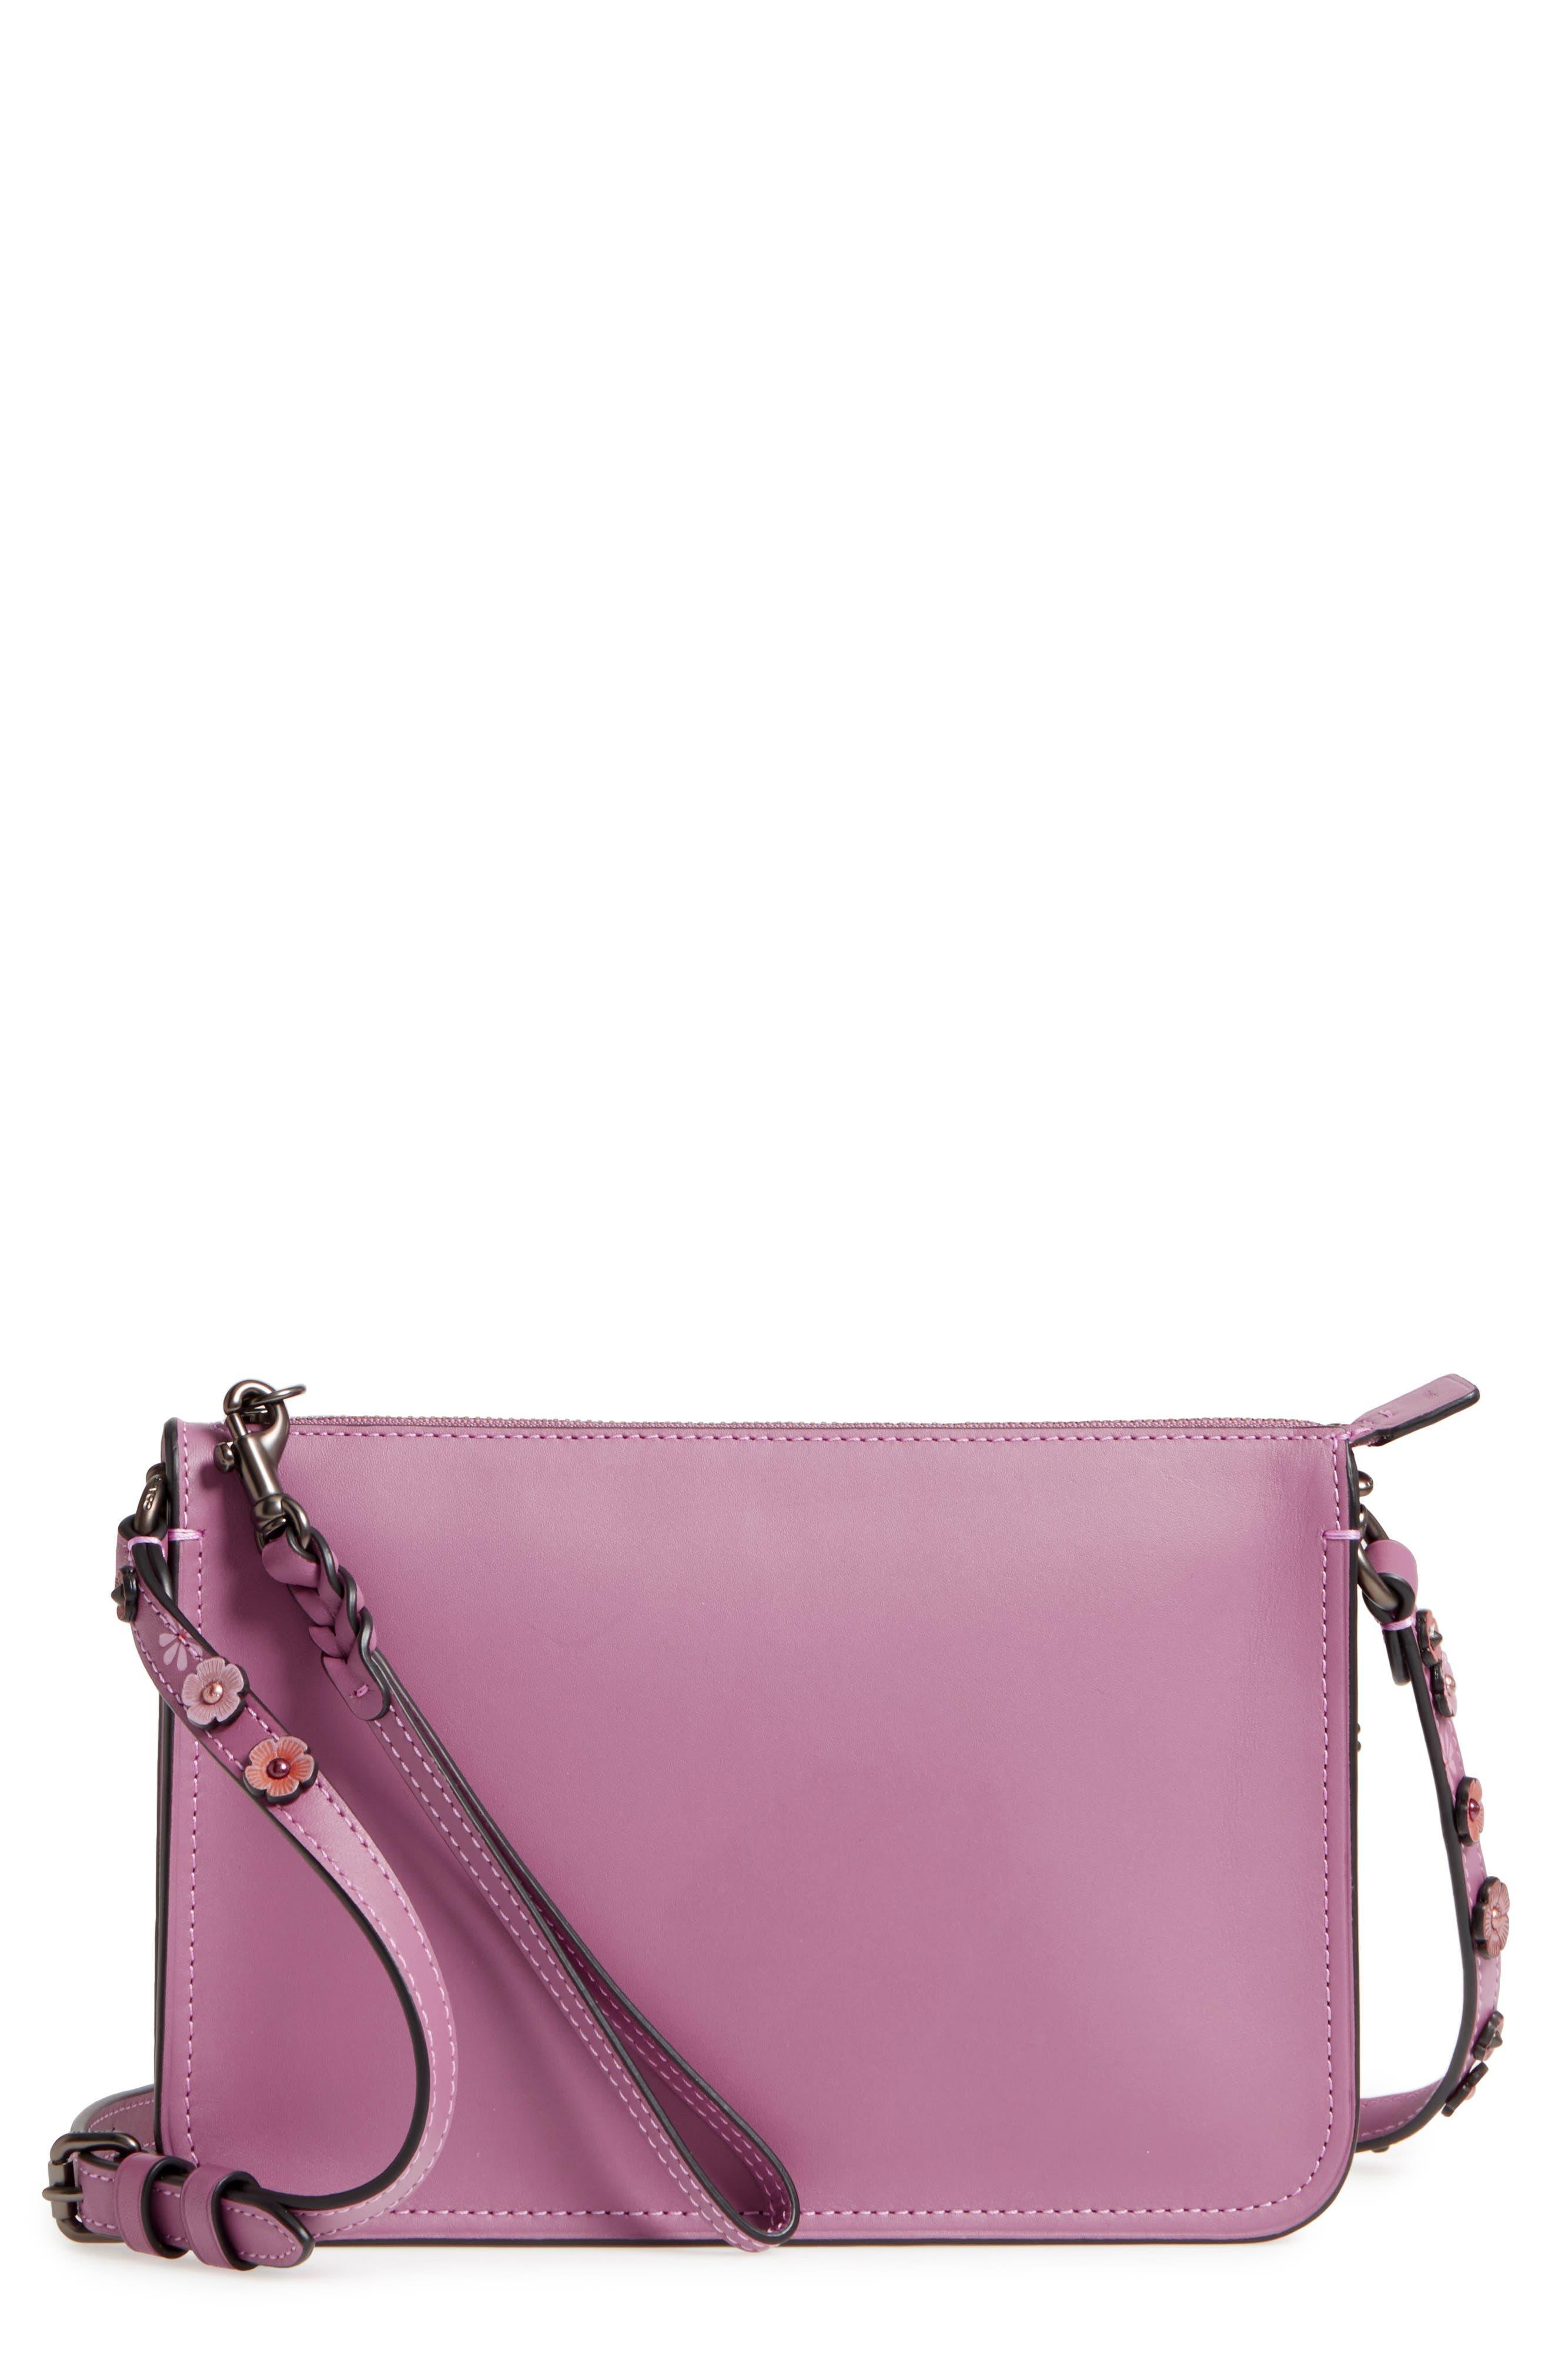 COACH 1941 Tea Rose Soho Leather Crossbody Bag